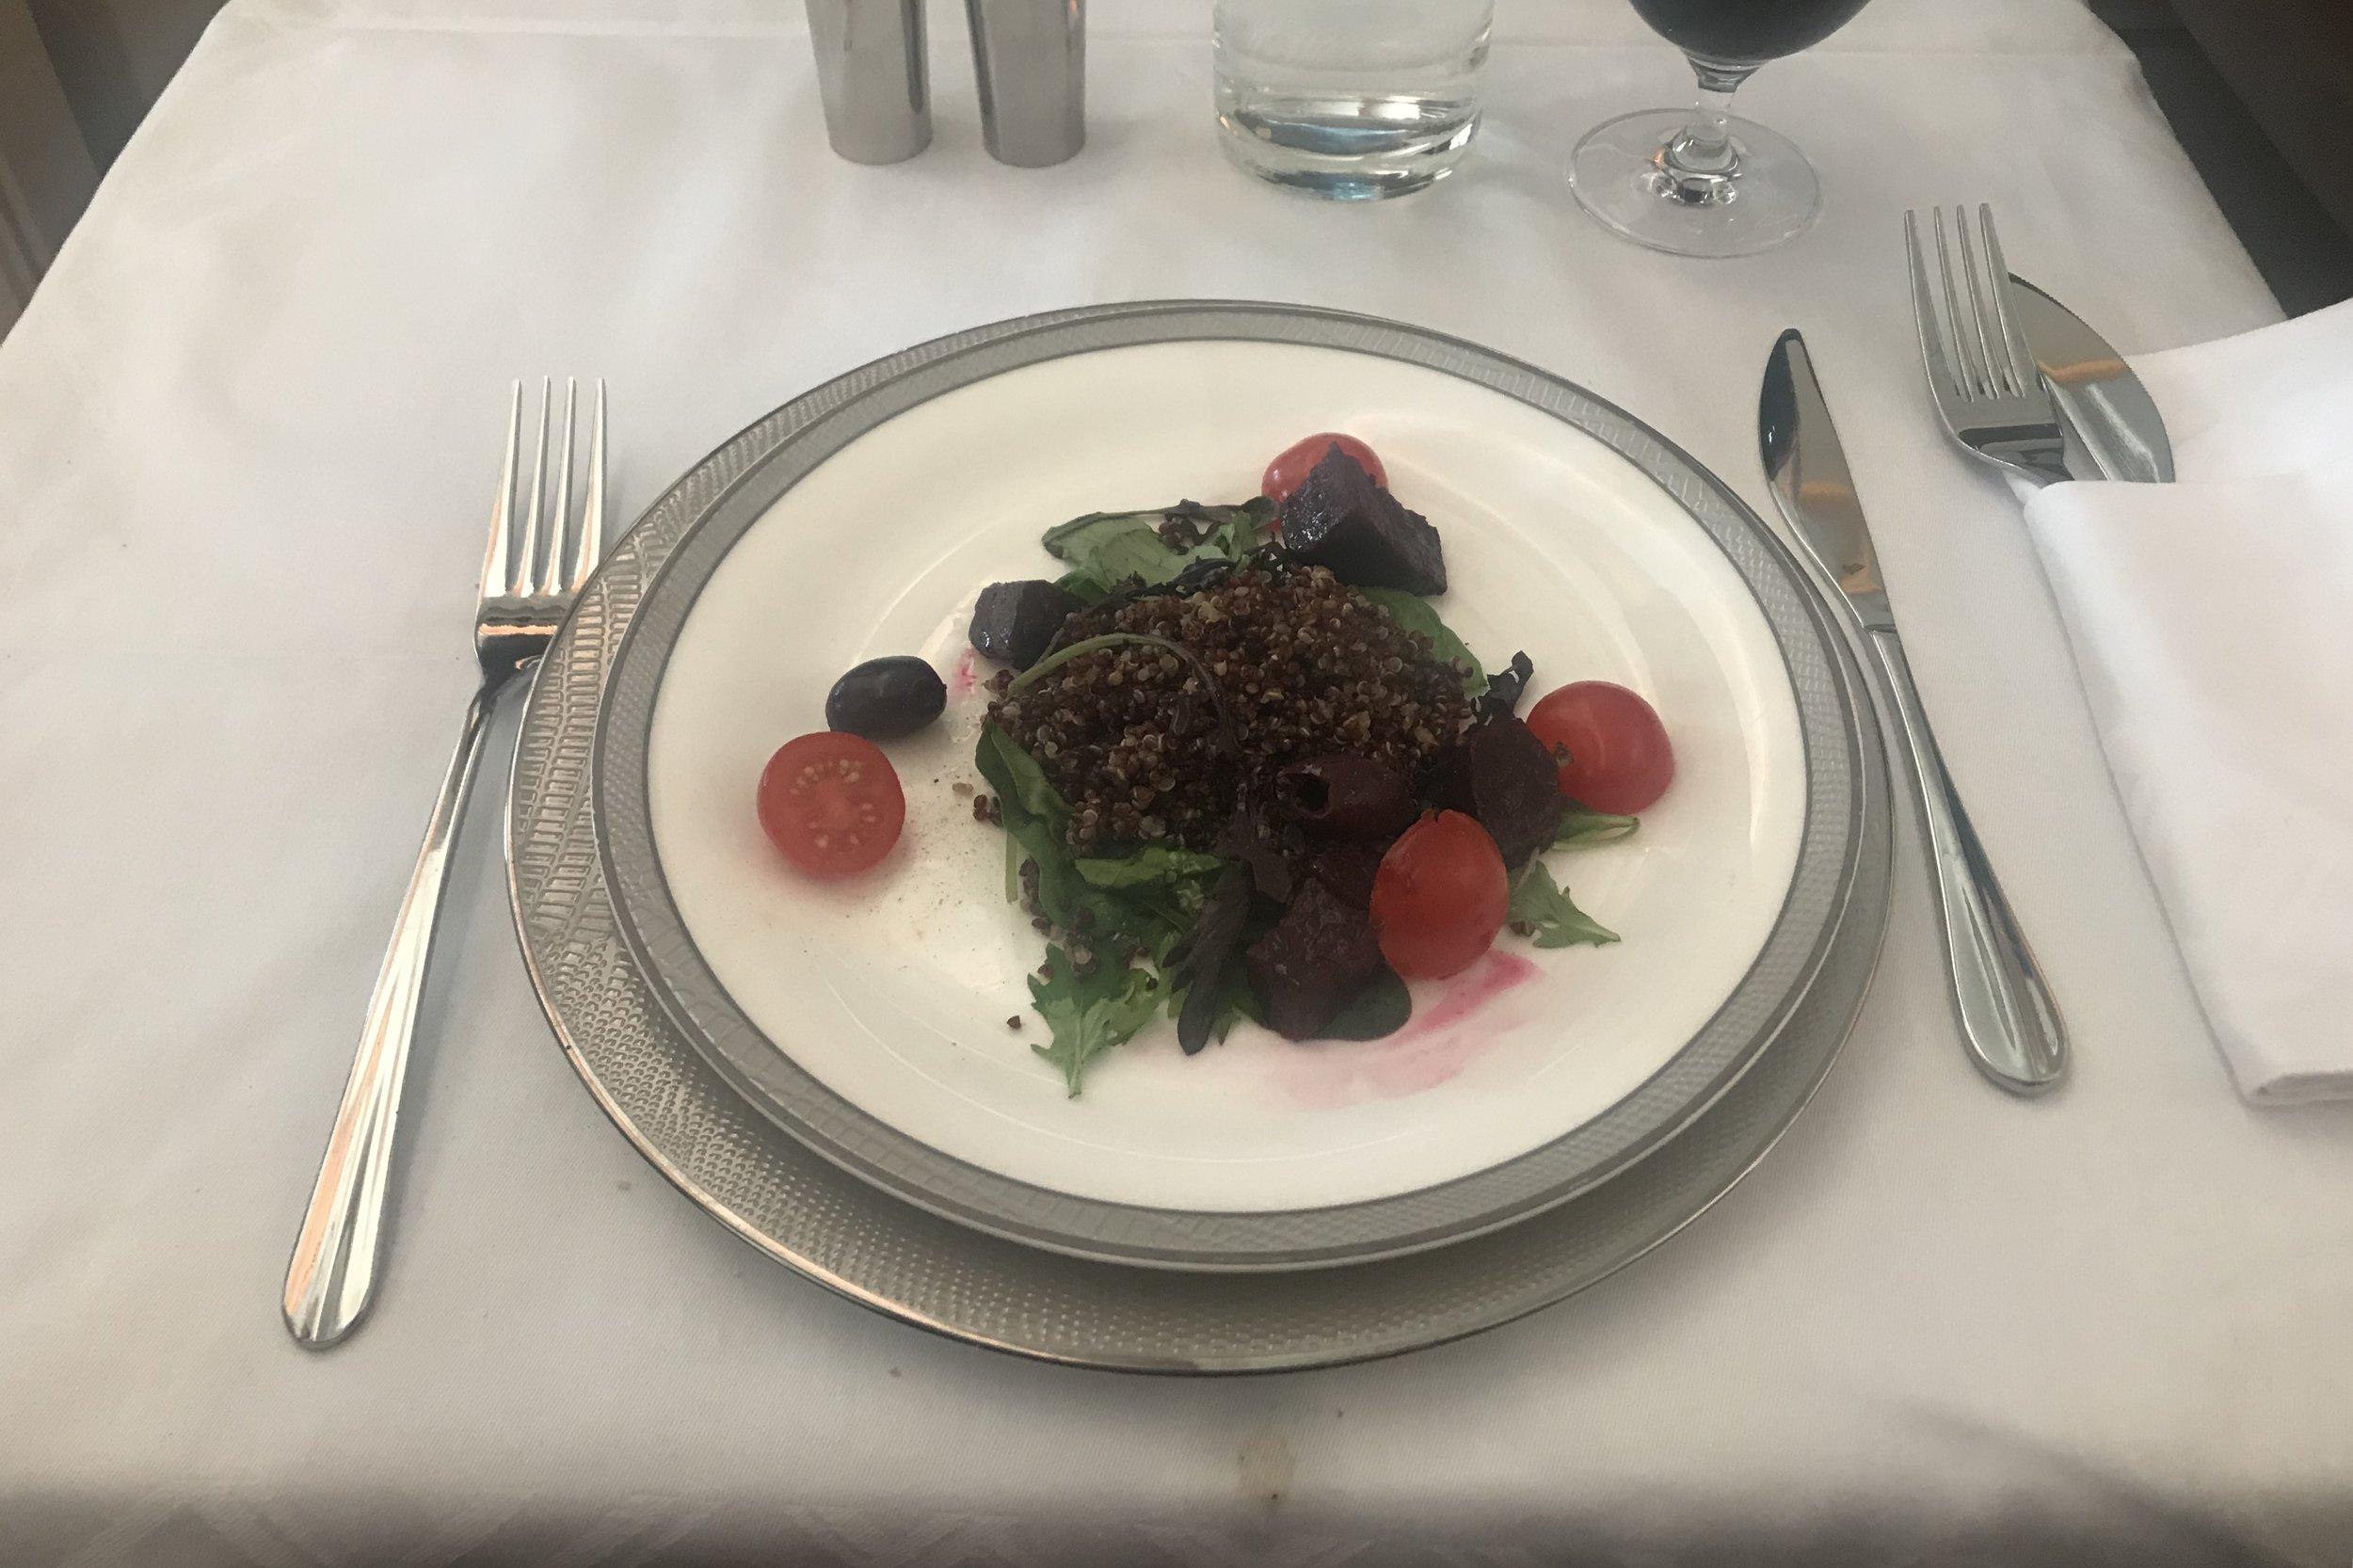 Singapore Airlines Suites Class – Salad